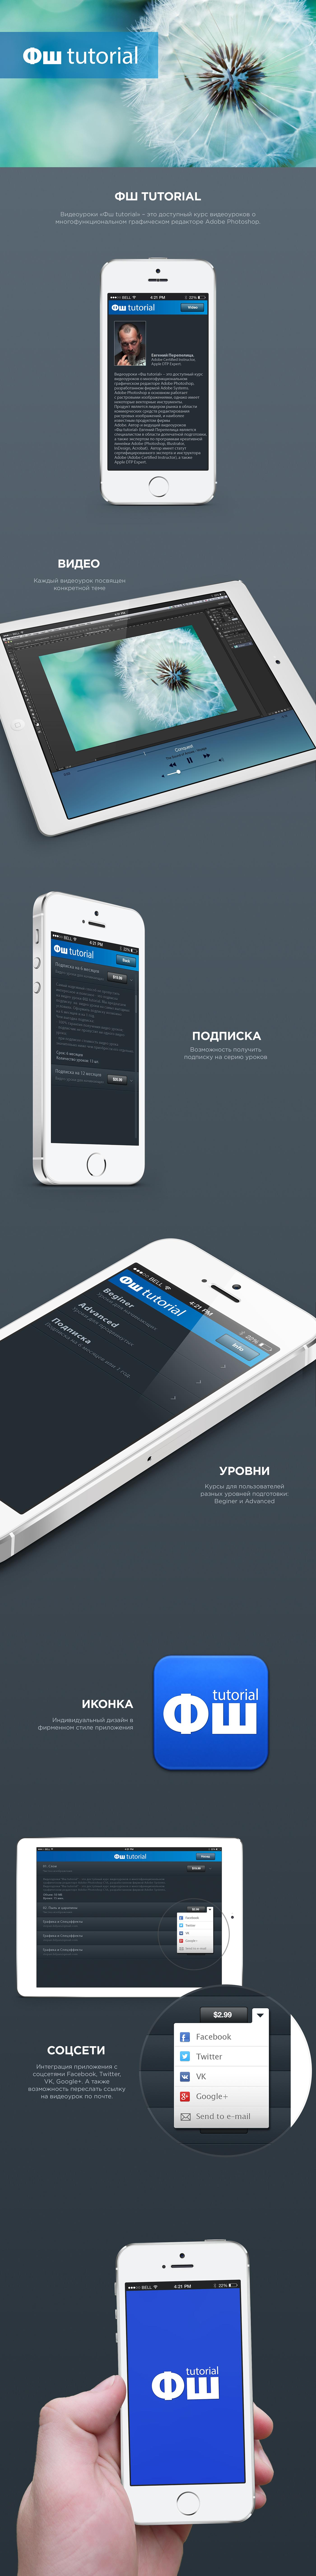 app ios iphone iPad photoshop tutorial